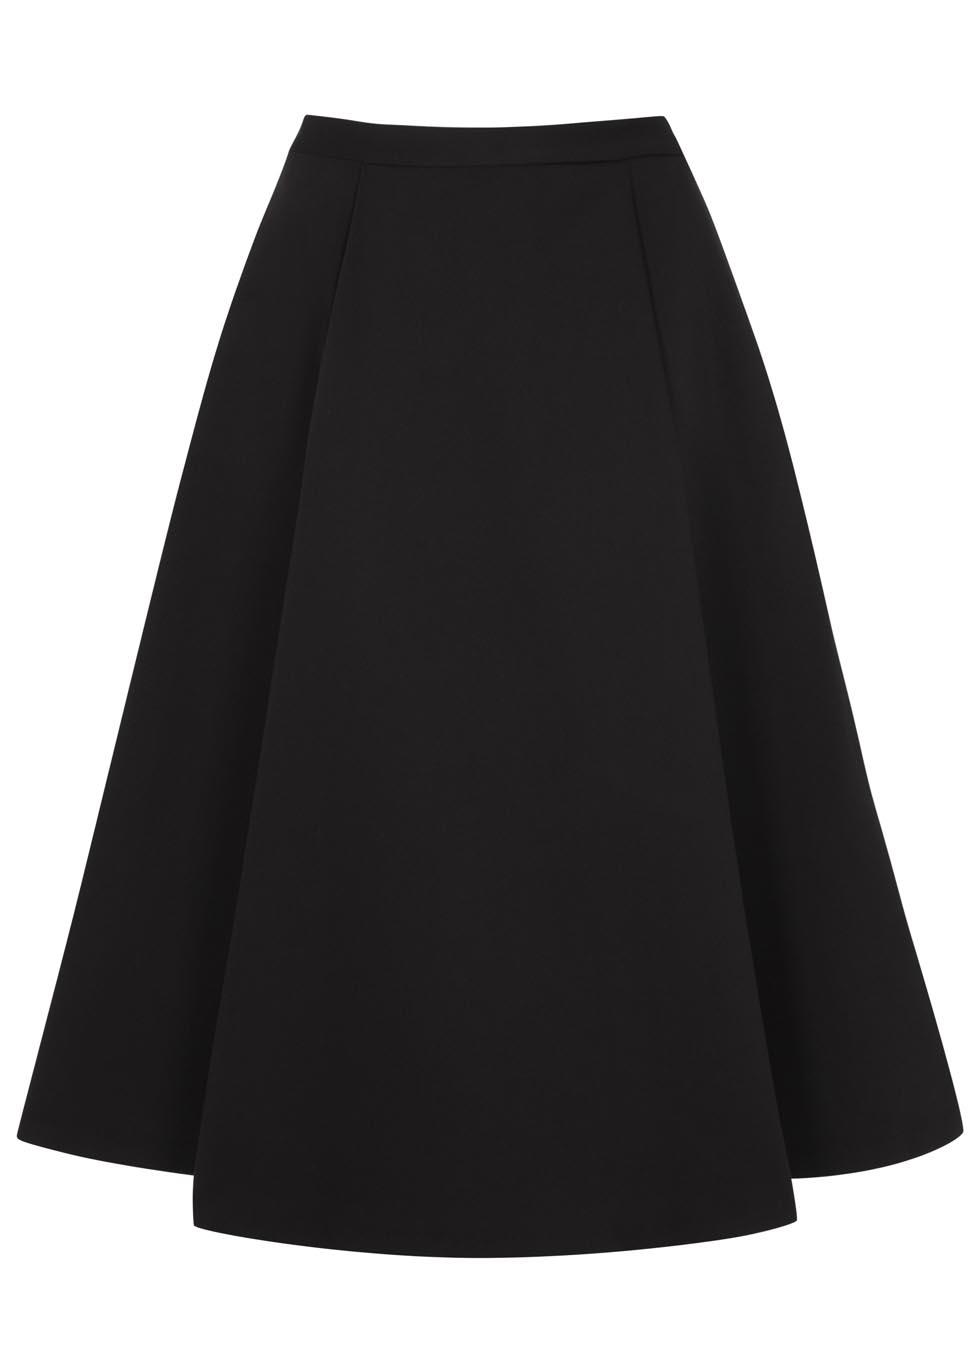 Alice   olivia black cotton blend midi skirt